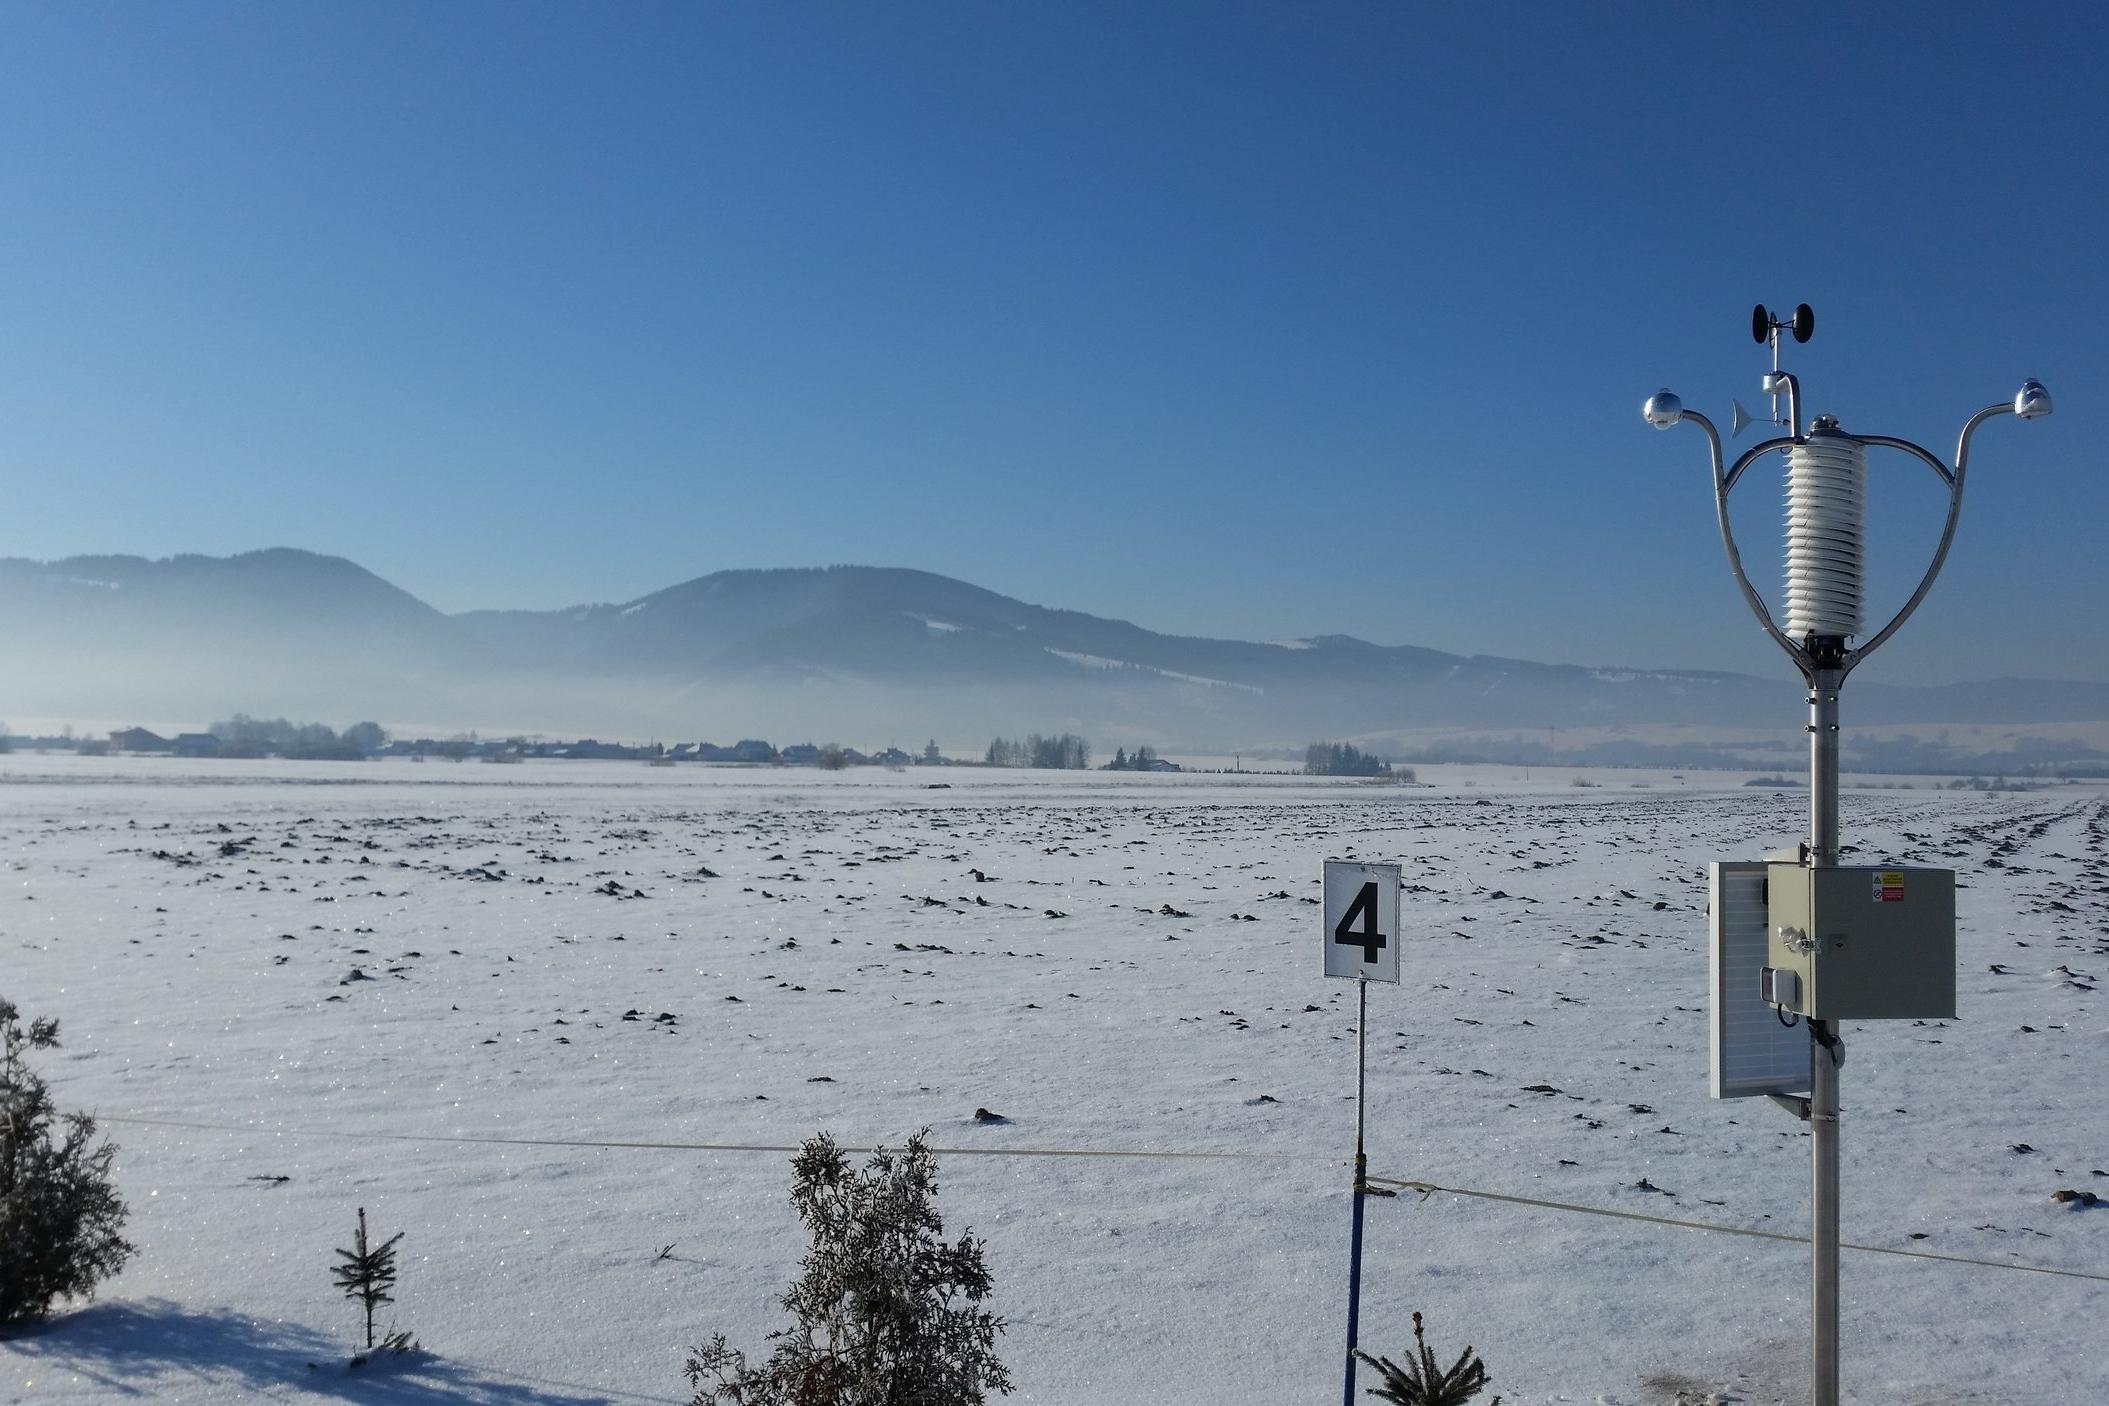 Winter AWS wireless weather station at International airport Aerodrome Jasna, Slovakia. ICAO code: LZJS http://www.letisko-jasna.sk/en/  (before installation of white fence)